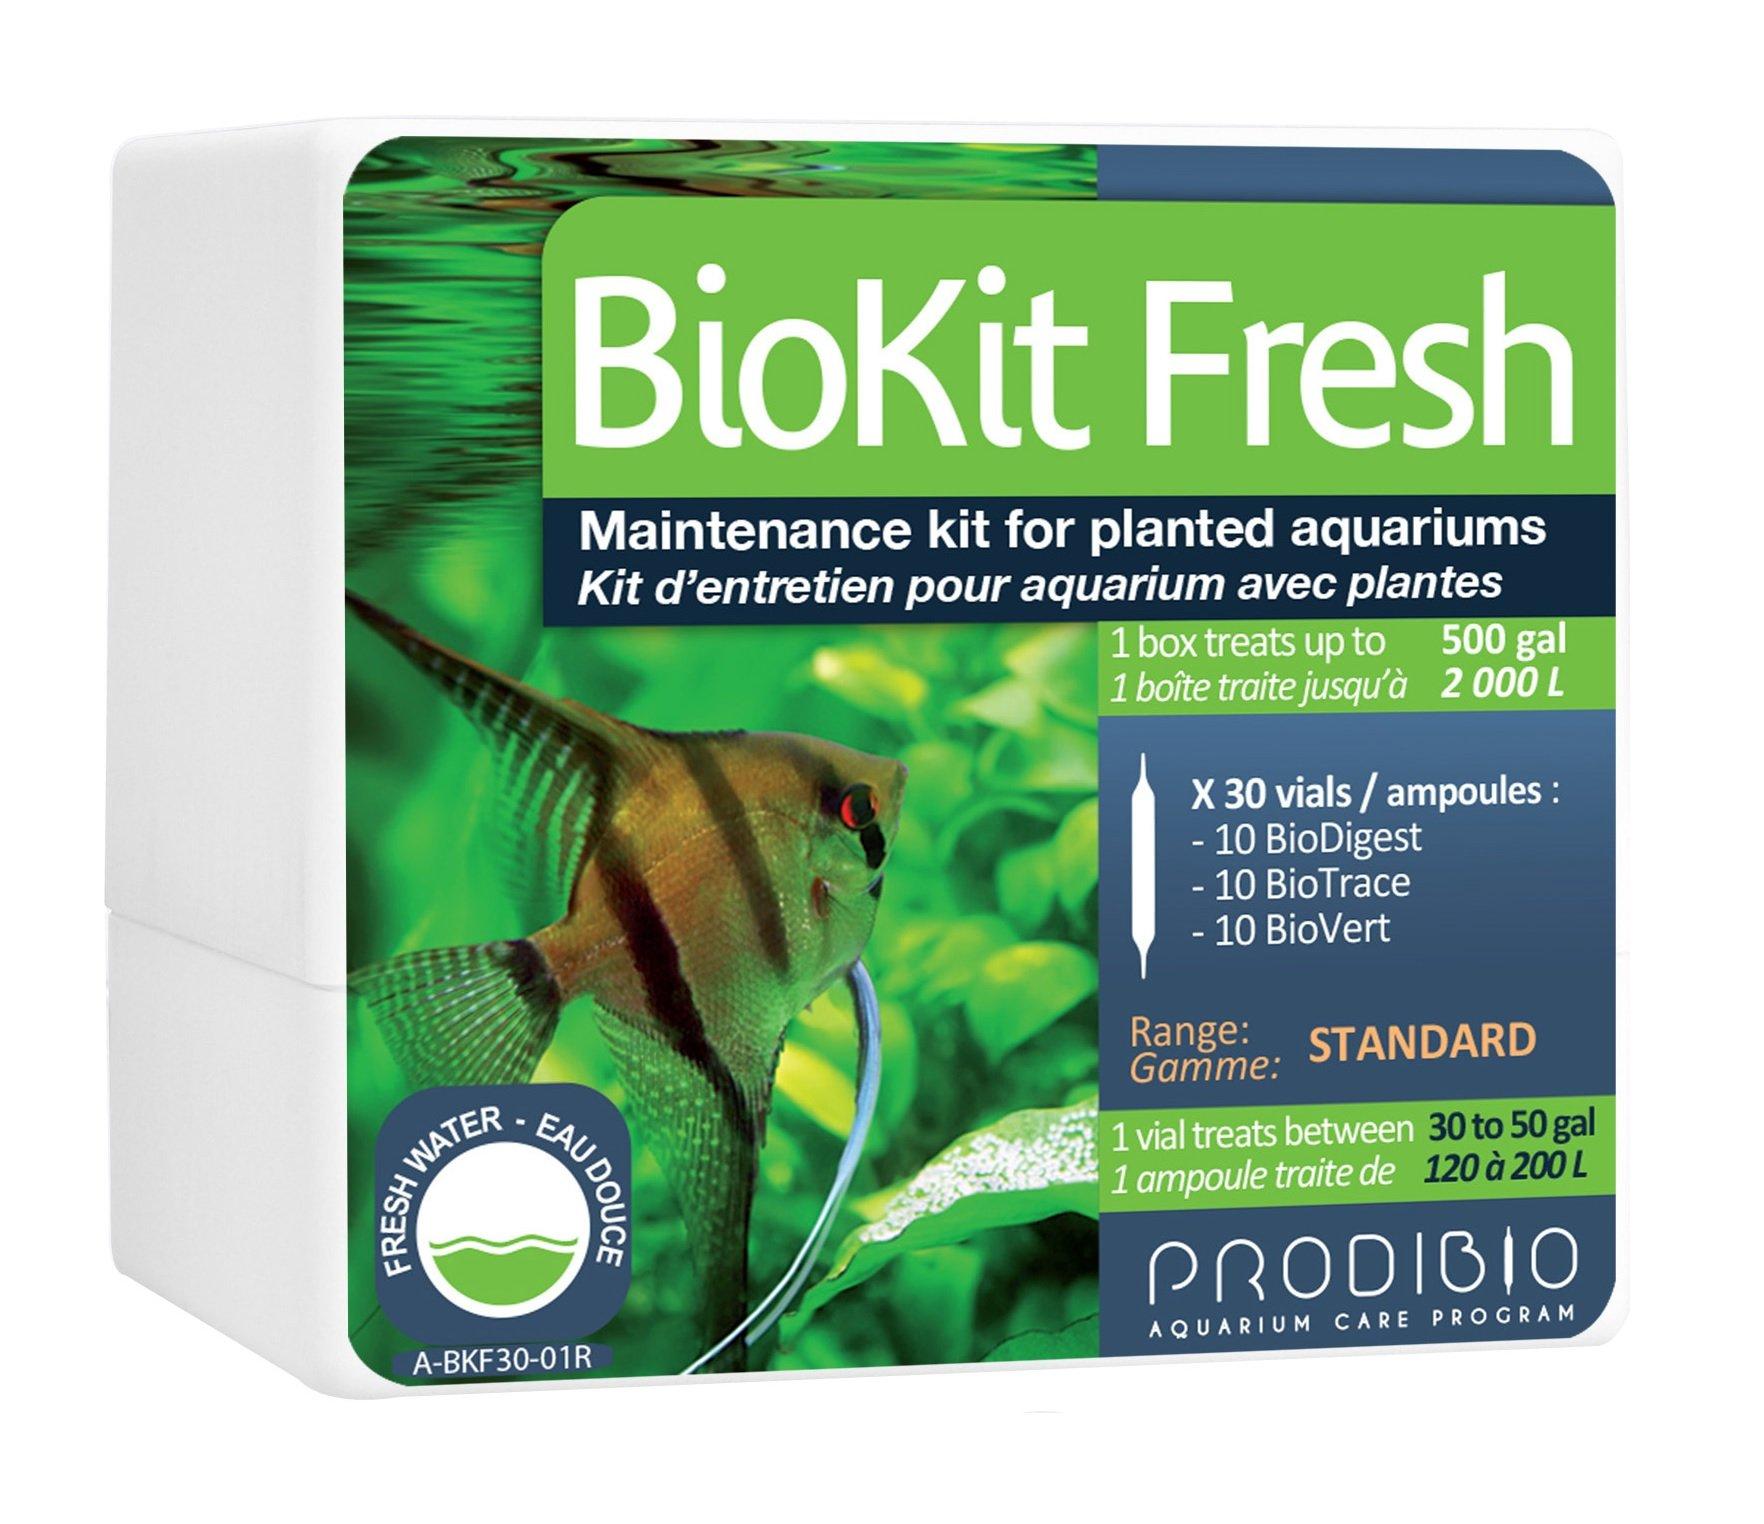 Prodibio Bio Kit, Planted Freshwater Mantenance, 30/1 mL vials, 30 gal and up by Prodibio